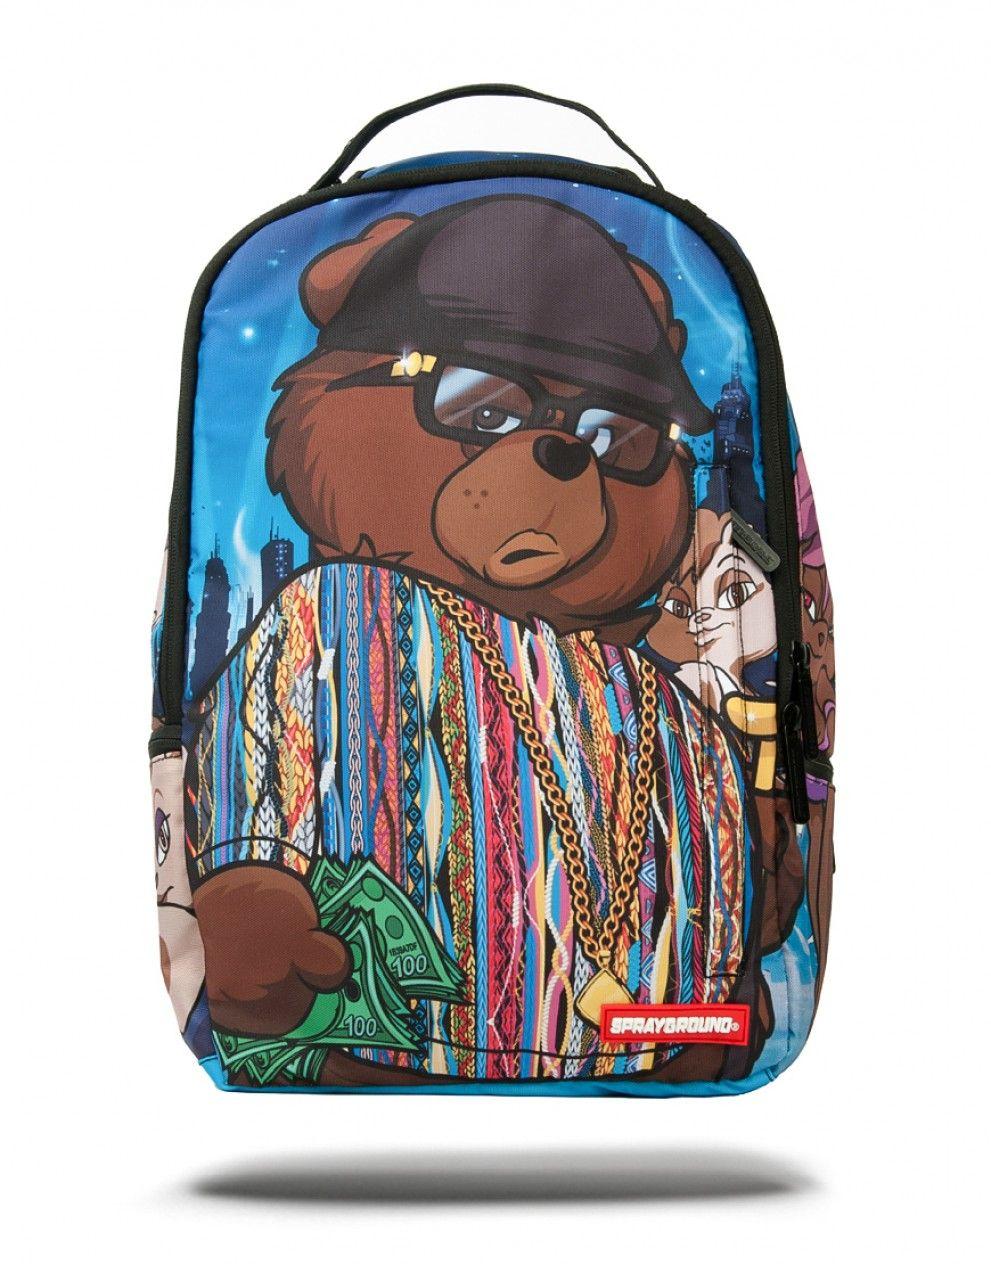 7dd7bad837c BIGGIE BEAR   Sprayground Backpacks, Bags, and Accessories ...